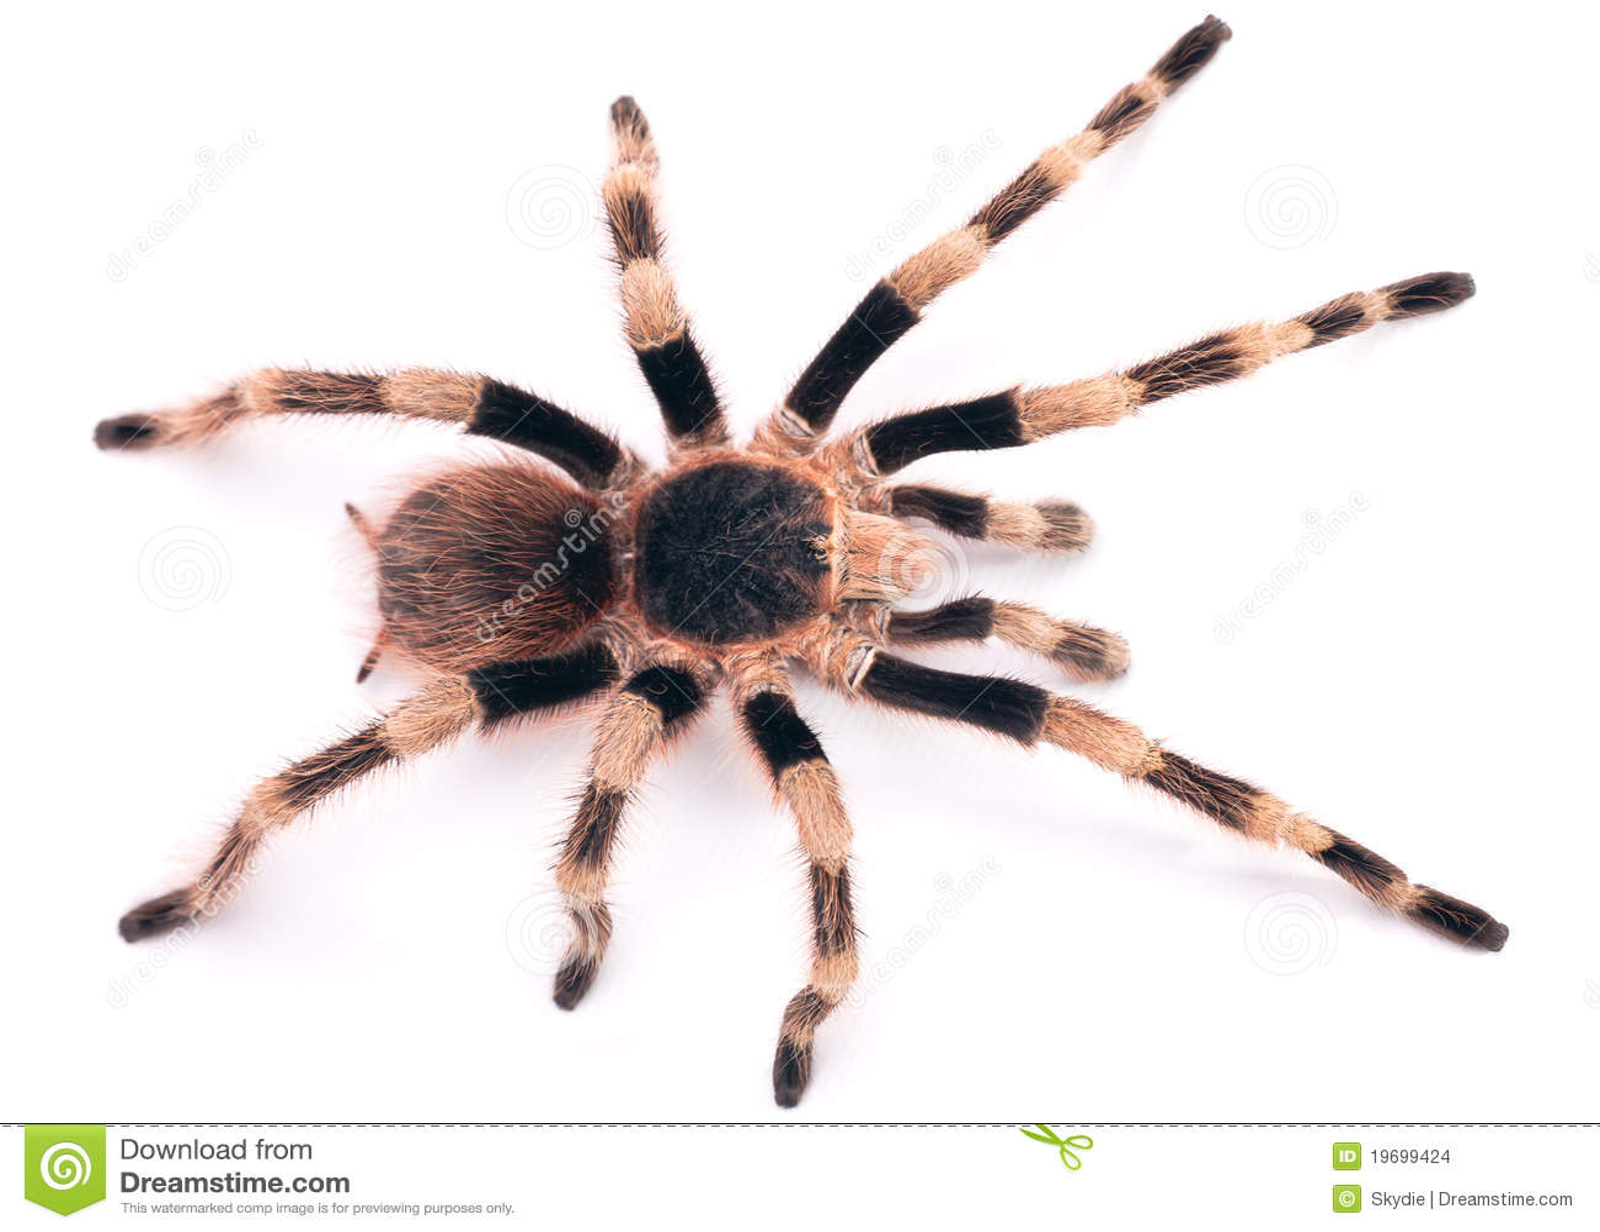 The Brazilian Black and White Tarantula (Nhandu coloratovillosus) is a ...